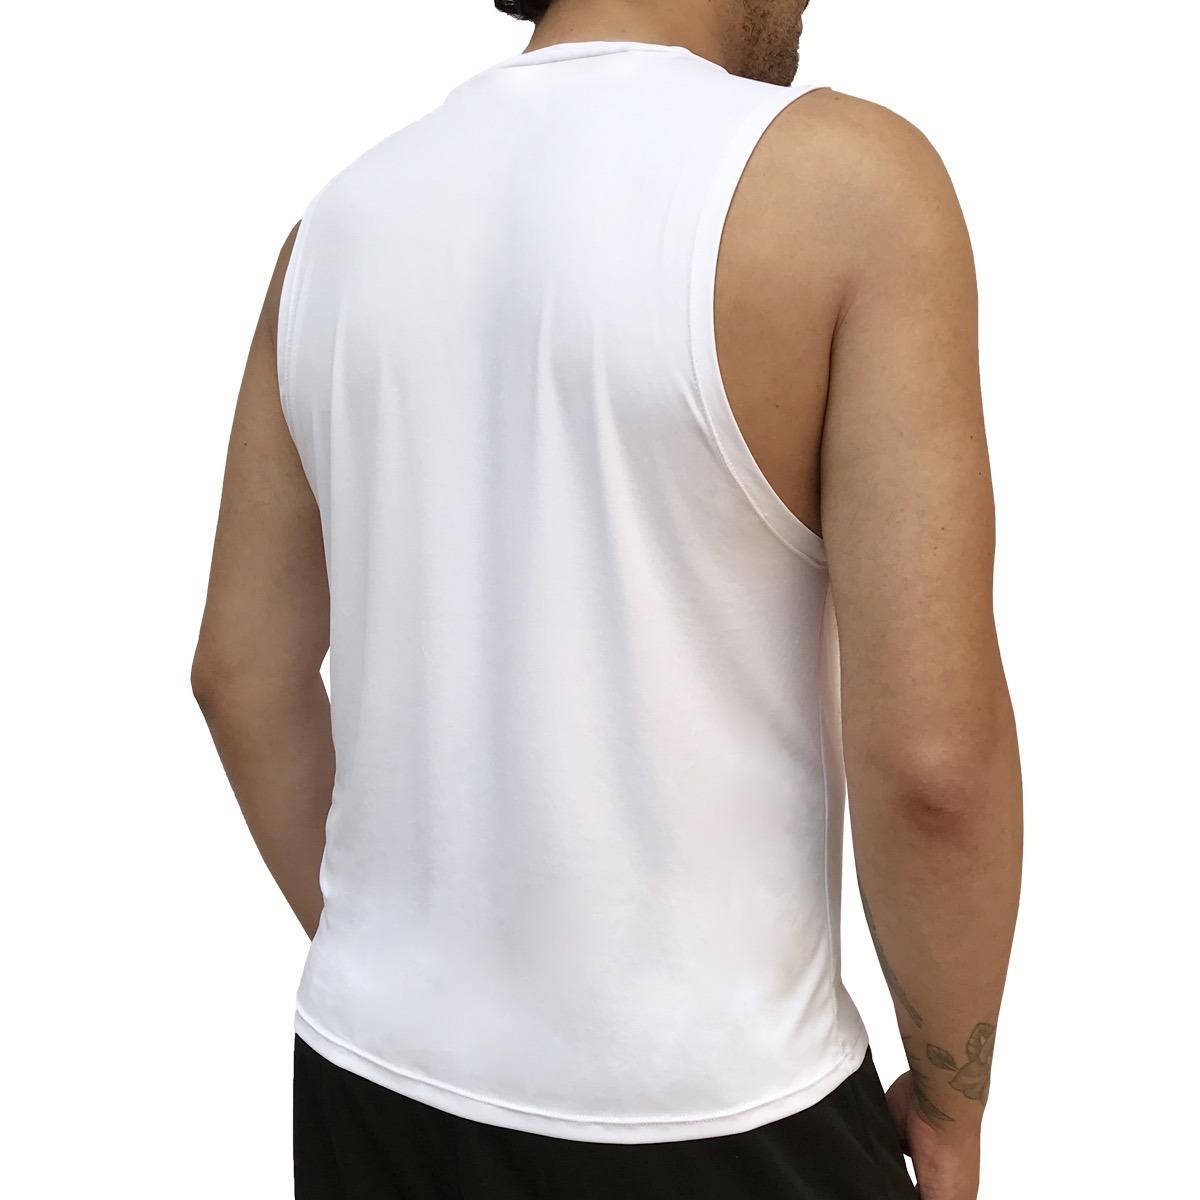 72a8262fb8593 6 camisetas regata masculina fitness dry fit 100% poliamida. Carregando zoom .